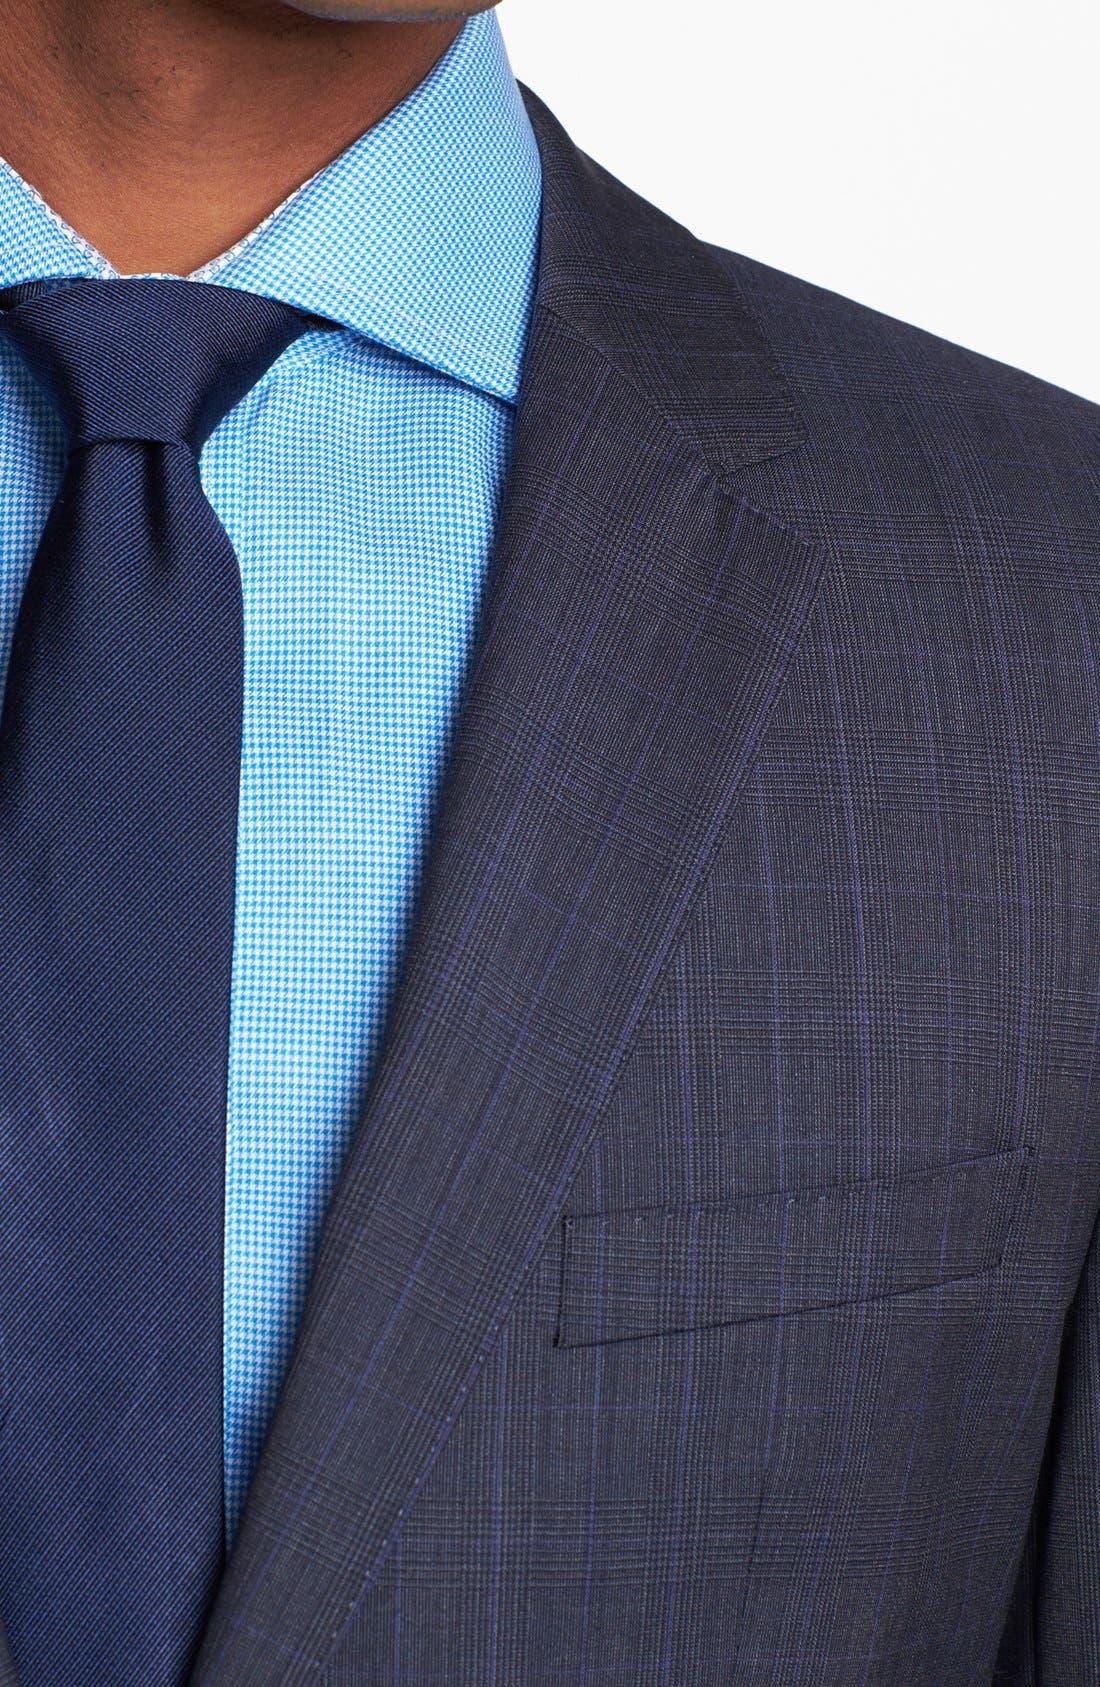 Alternate Image 2  - BOSS HUGO BOSS 'James/Sharp' Trim Fit Plaid Suit